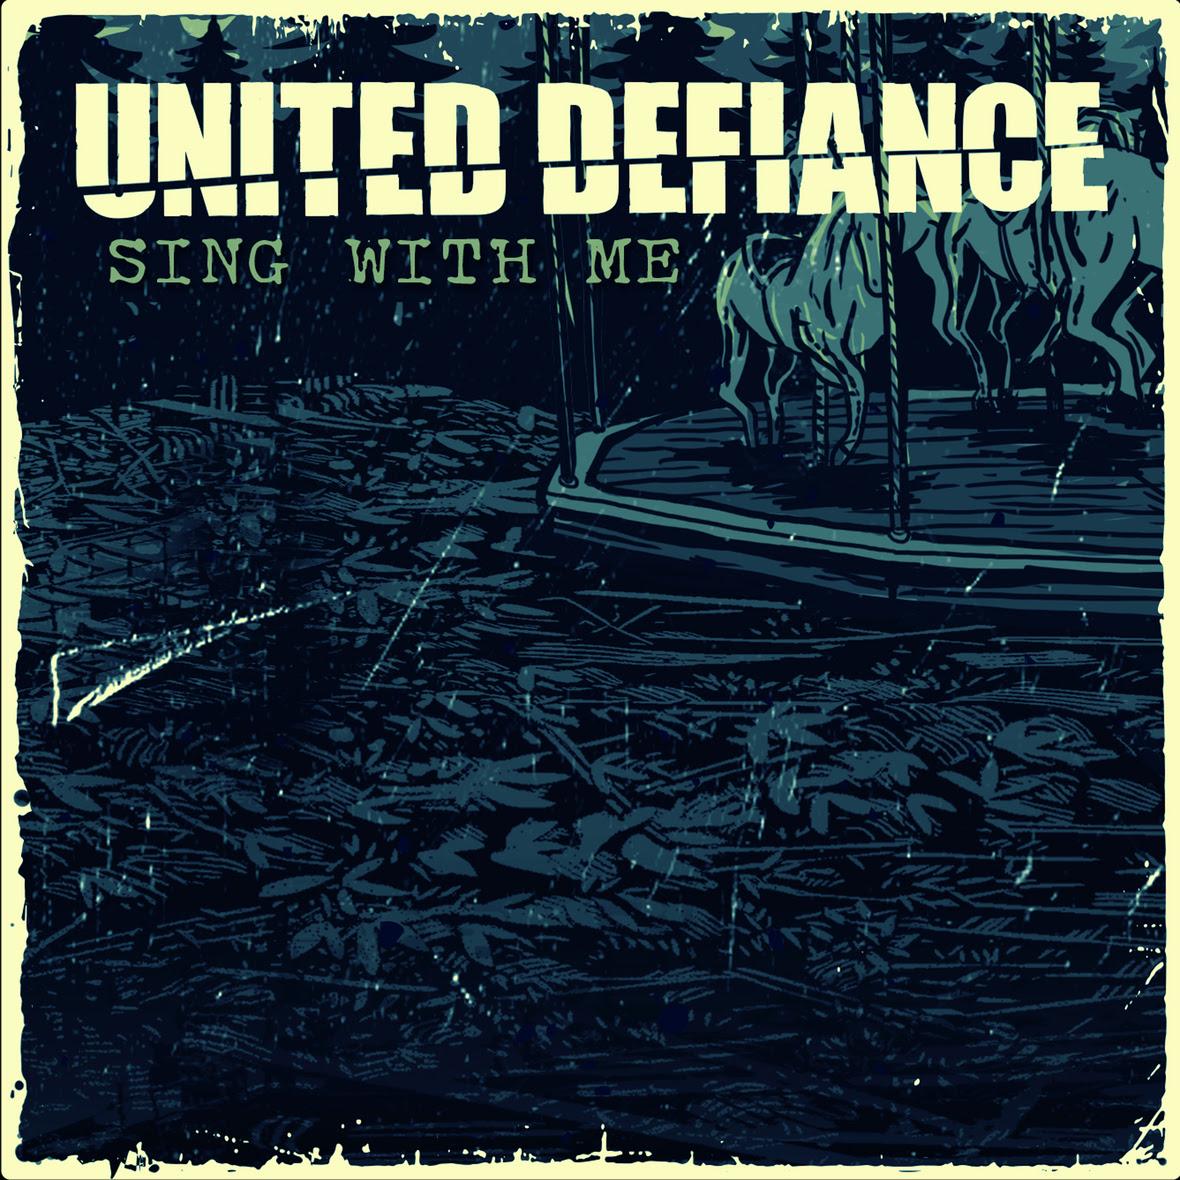 UnitedDefiance-SingWithMe-Cover2